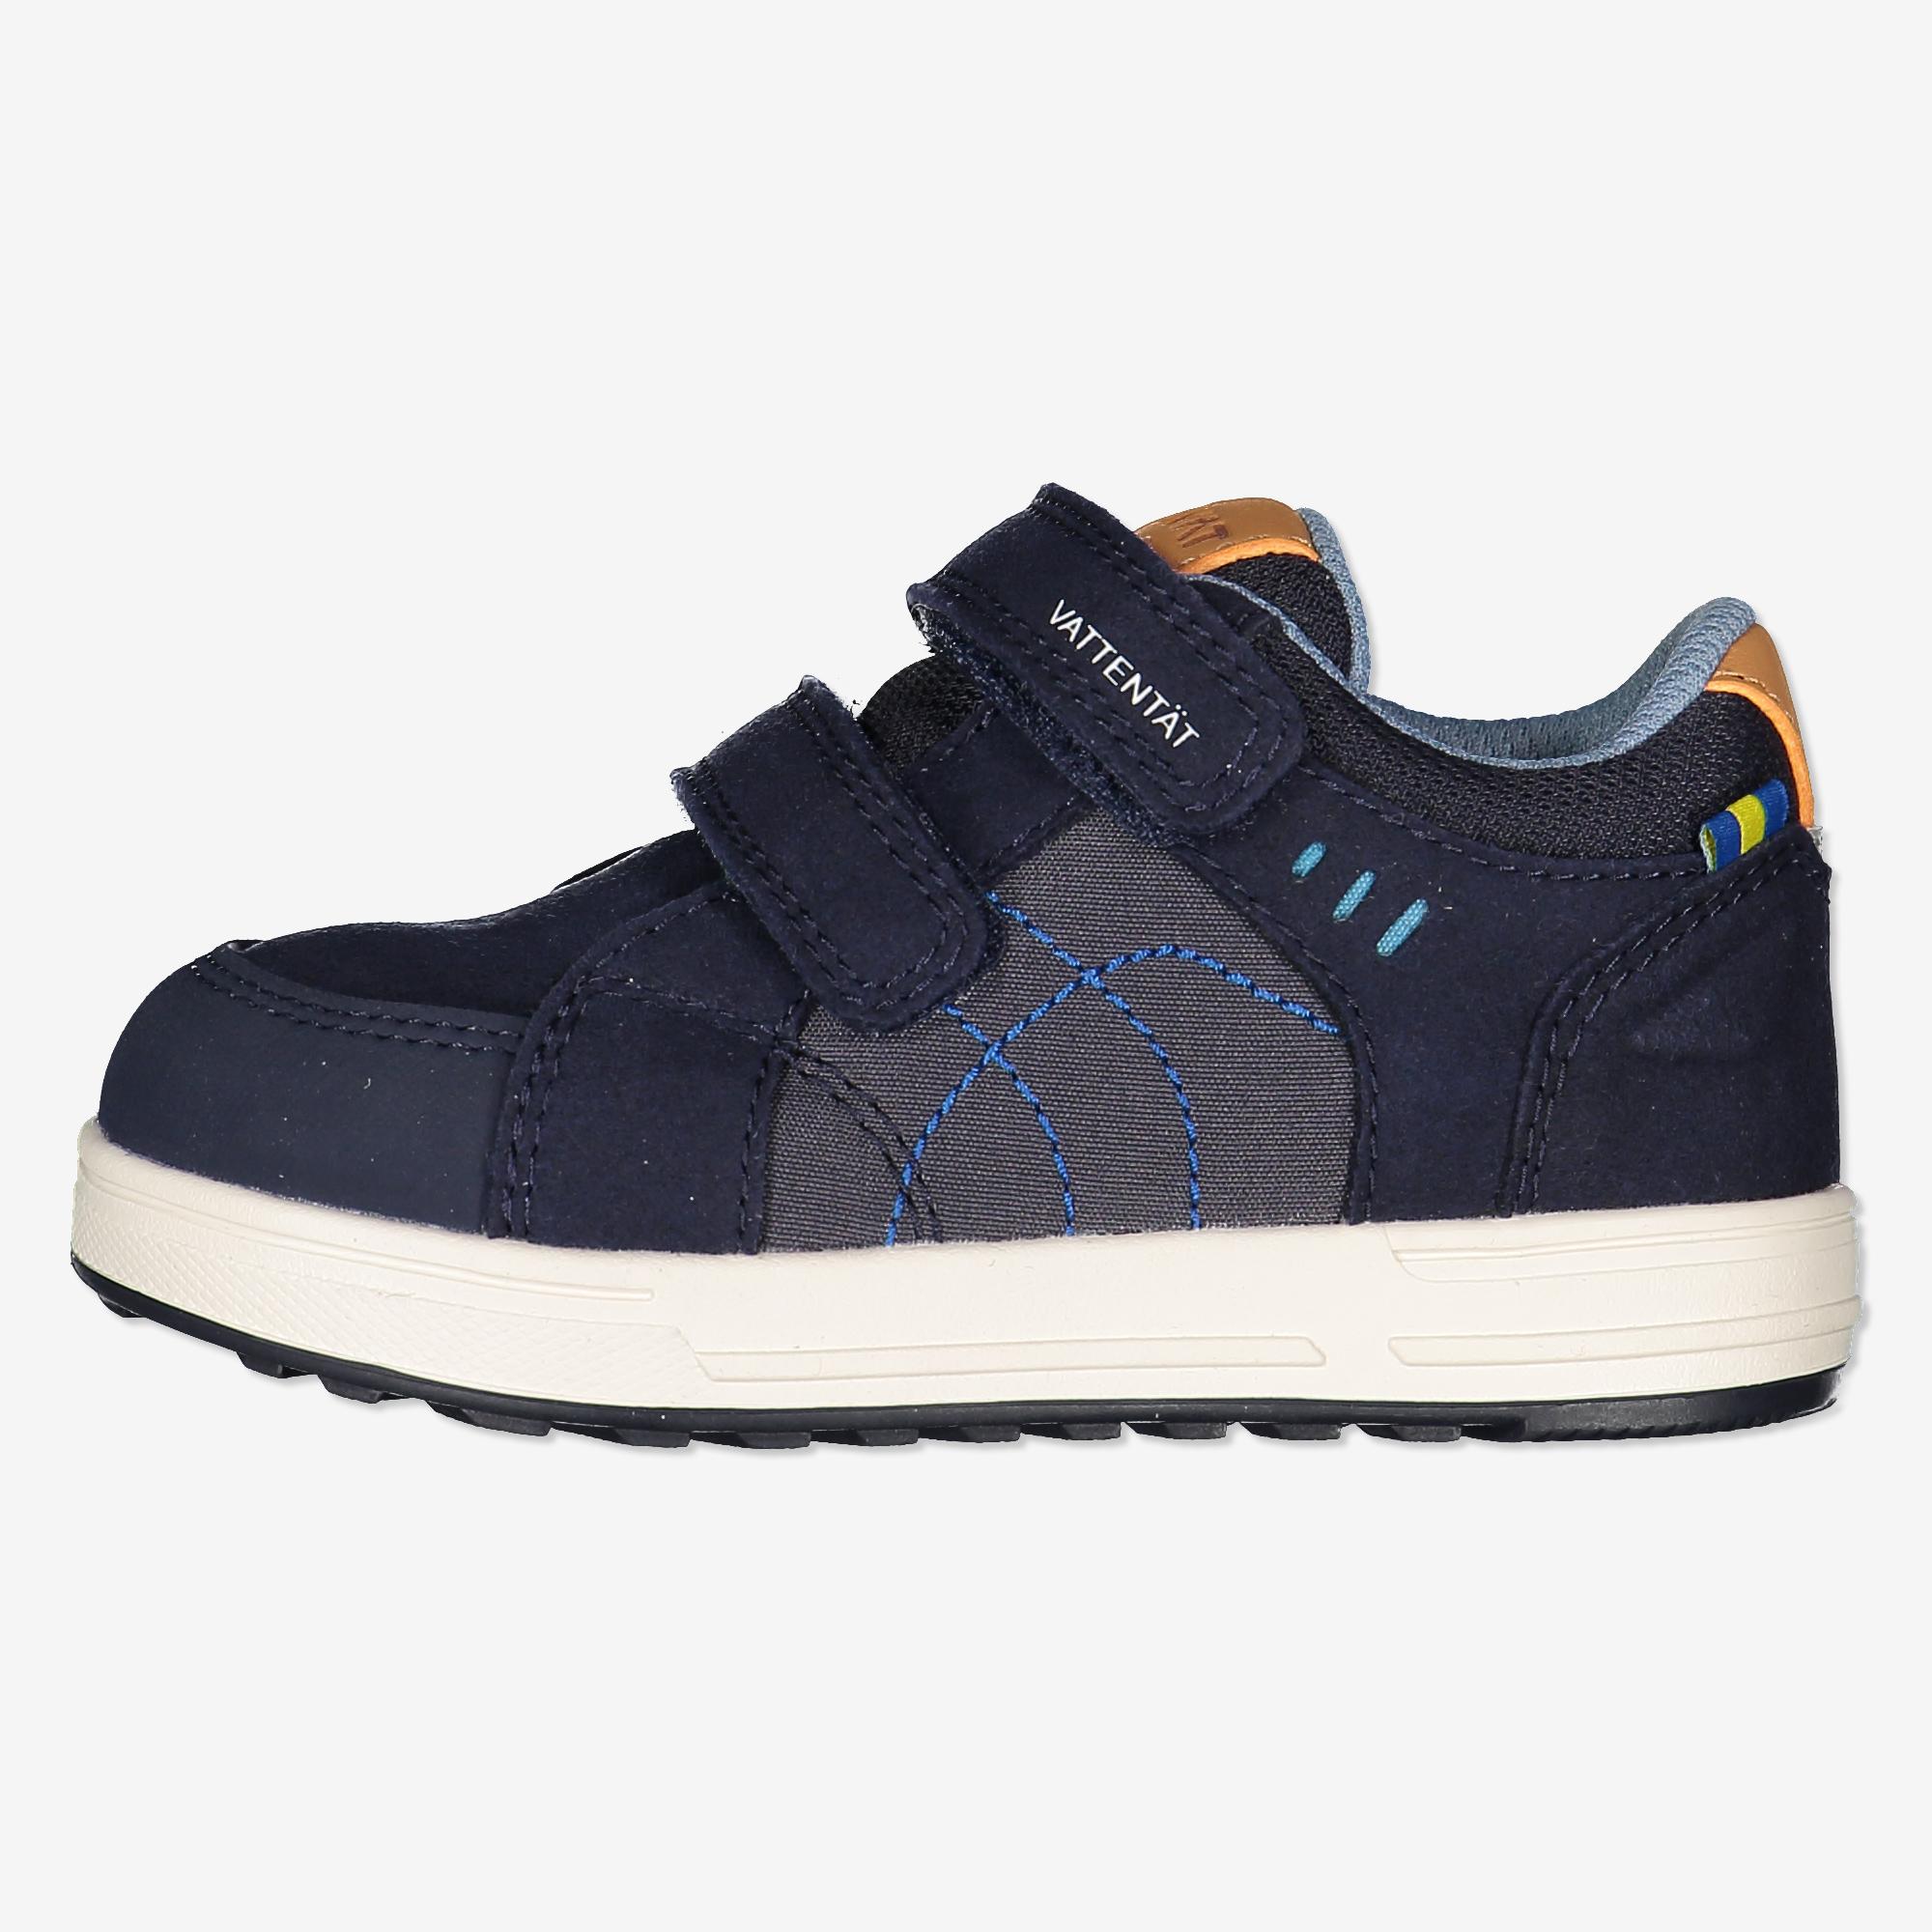 Sneaker kavat svedby wp mörk marinblå | Polarnopyret.se